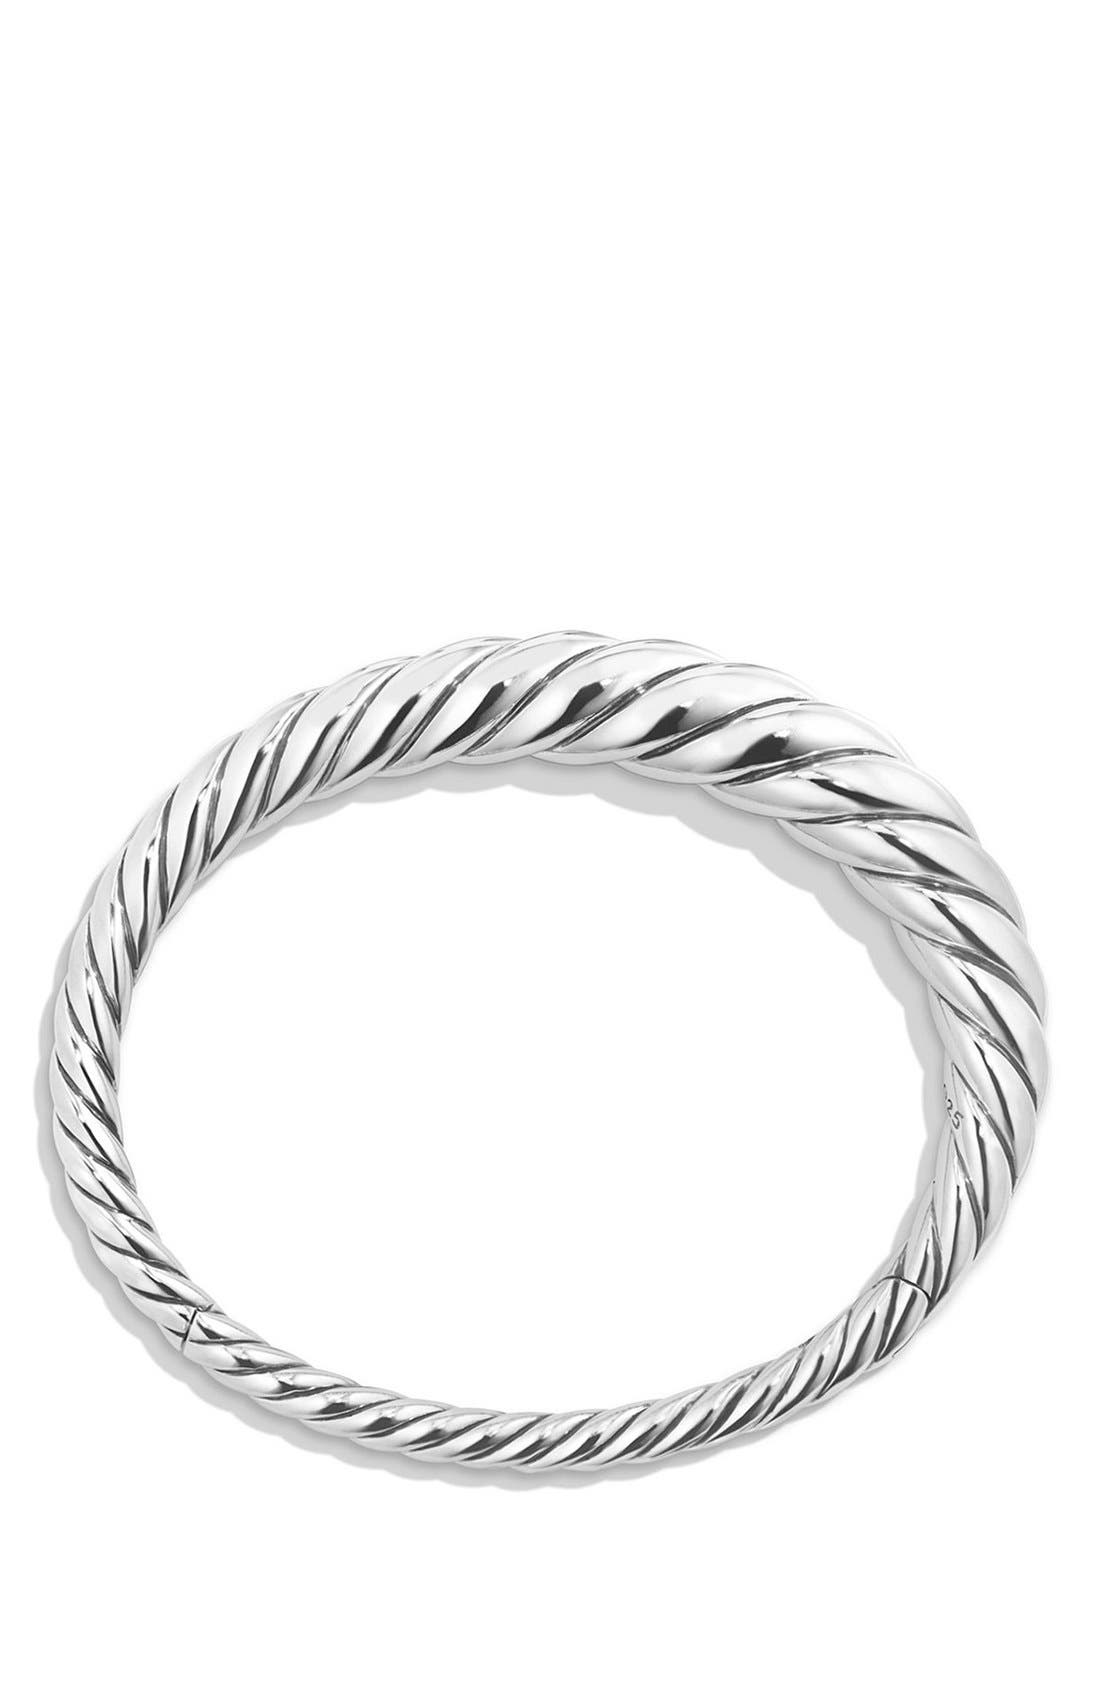 DAVID YURMAN, 'Pure Form' Small Cable Bracelet, Alternate thumbnail 2, color, SILVER